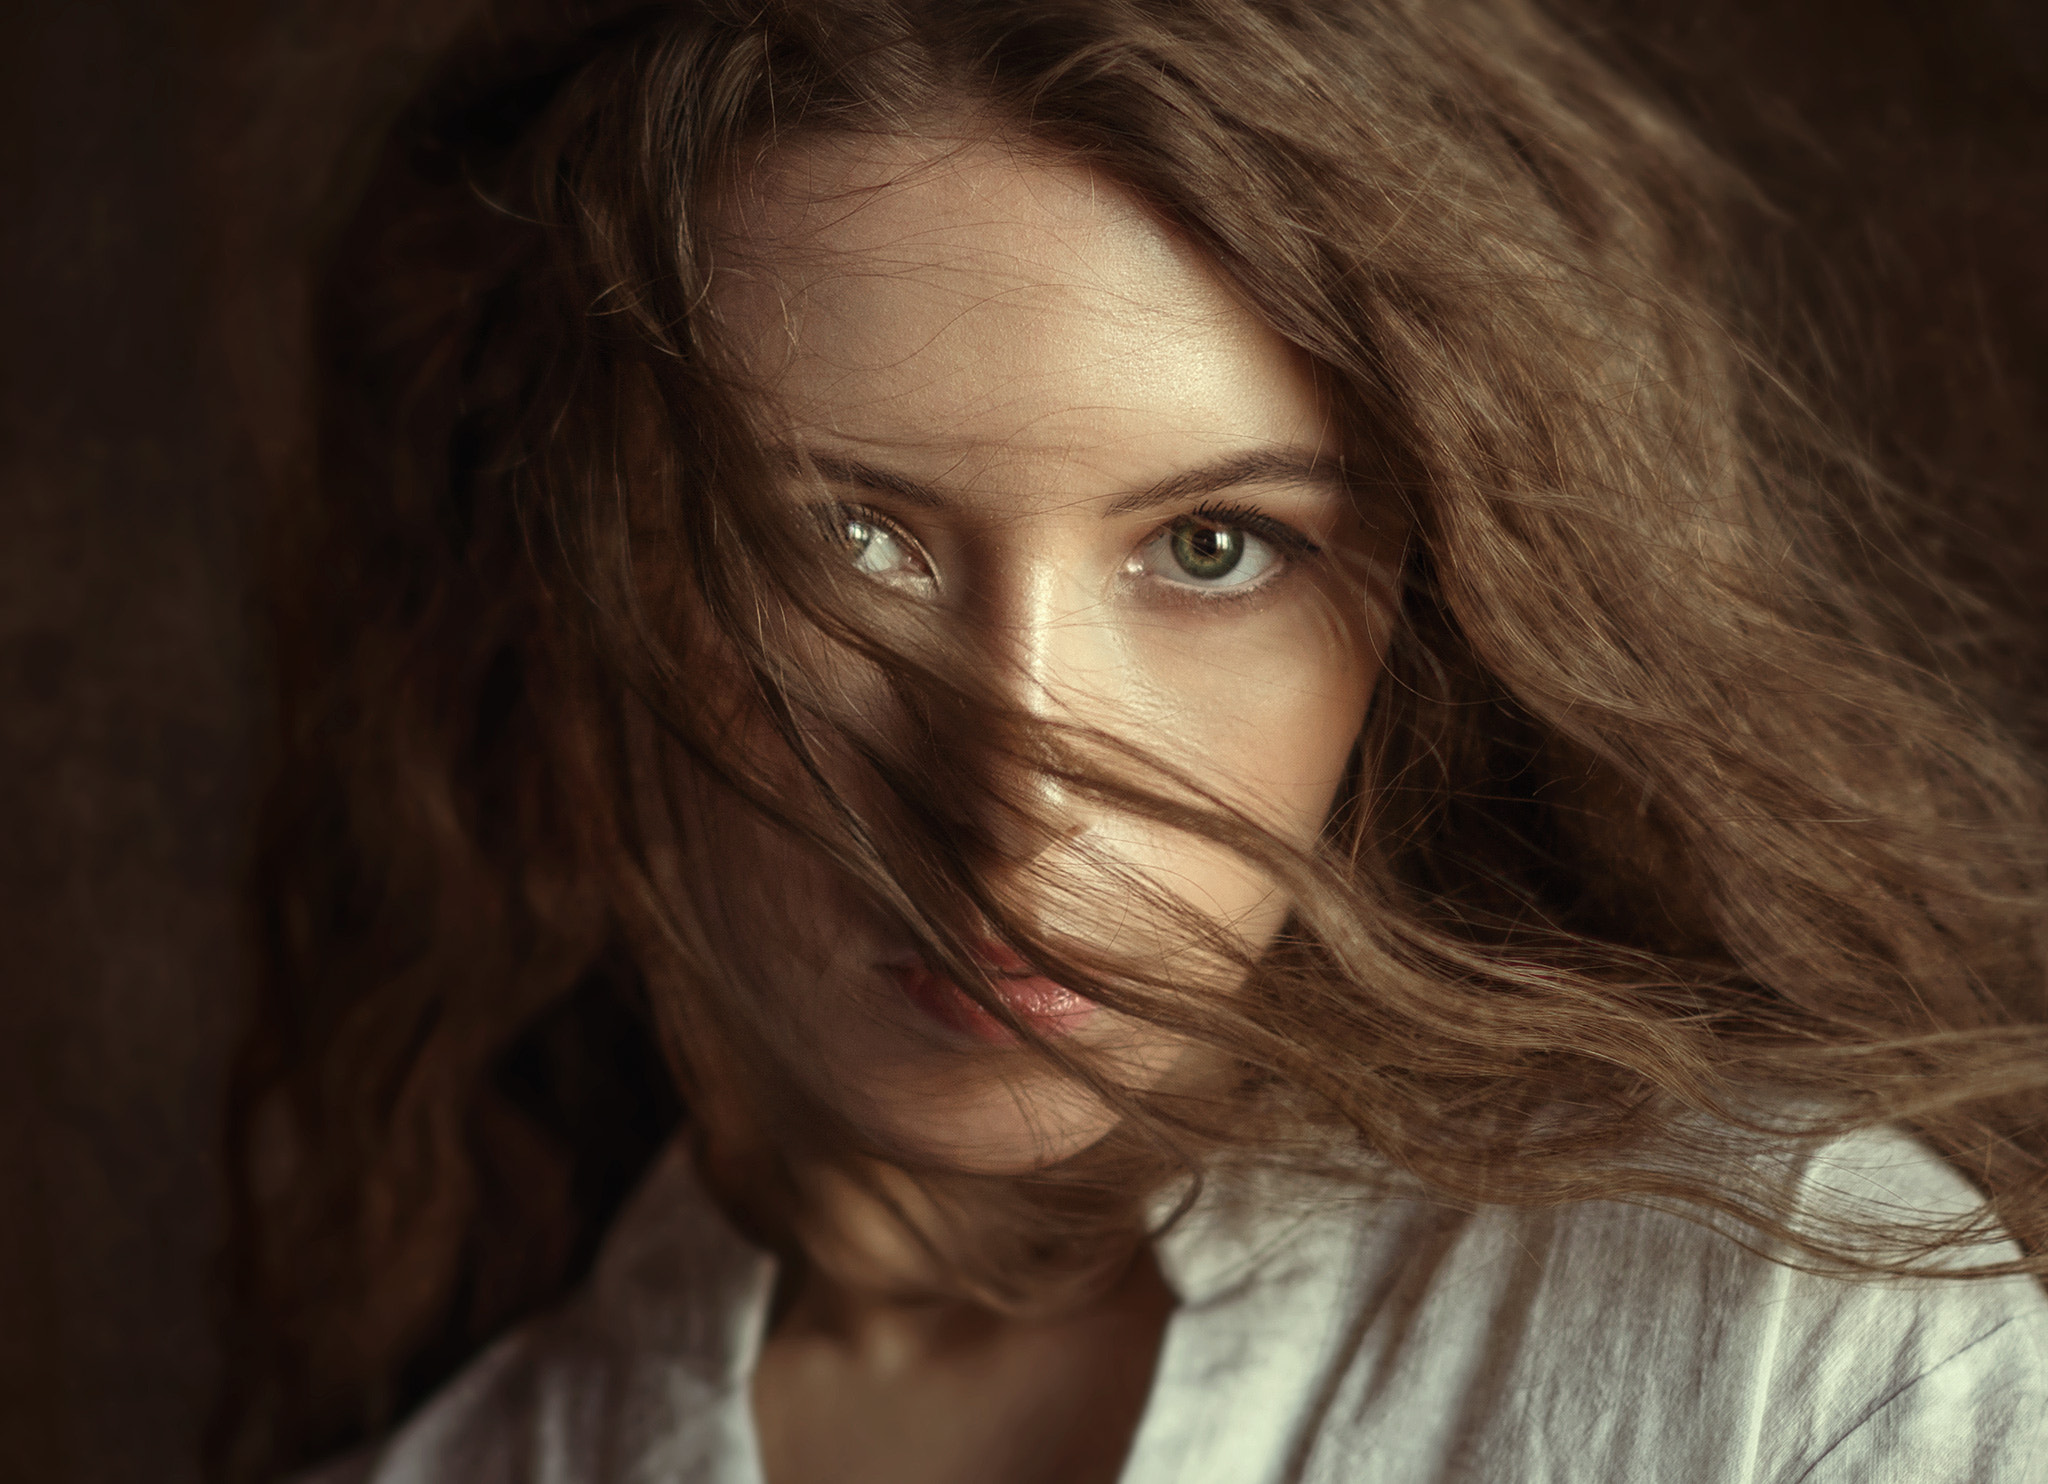 People 2048x1484 Albert Lesnoy women Viki Virgo brunette long hair wavy hair wind looking at viewer white clothing portrait Viktoria Makarenko